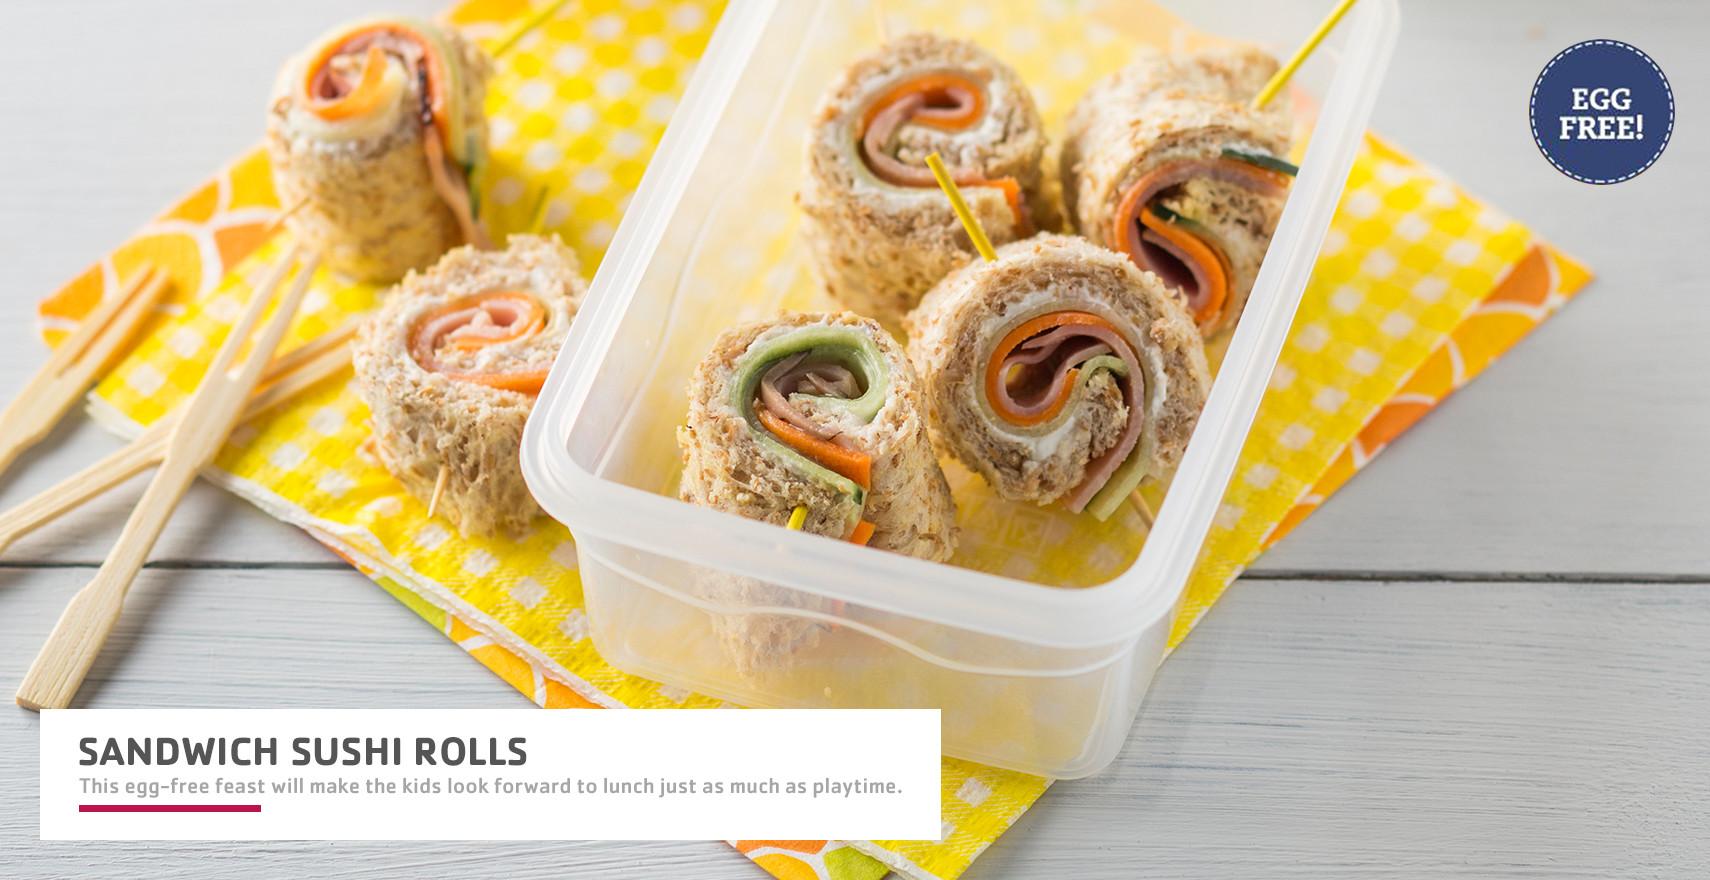 sandwich-sushi-rolls.jpg